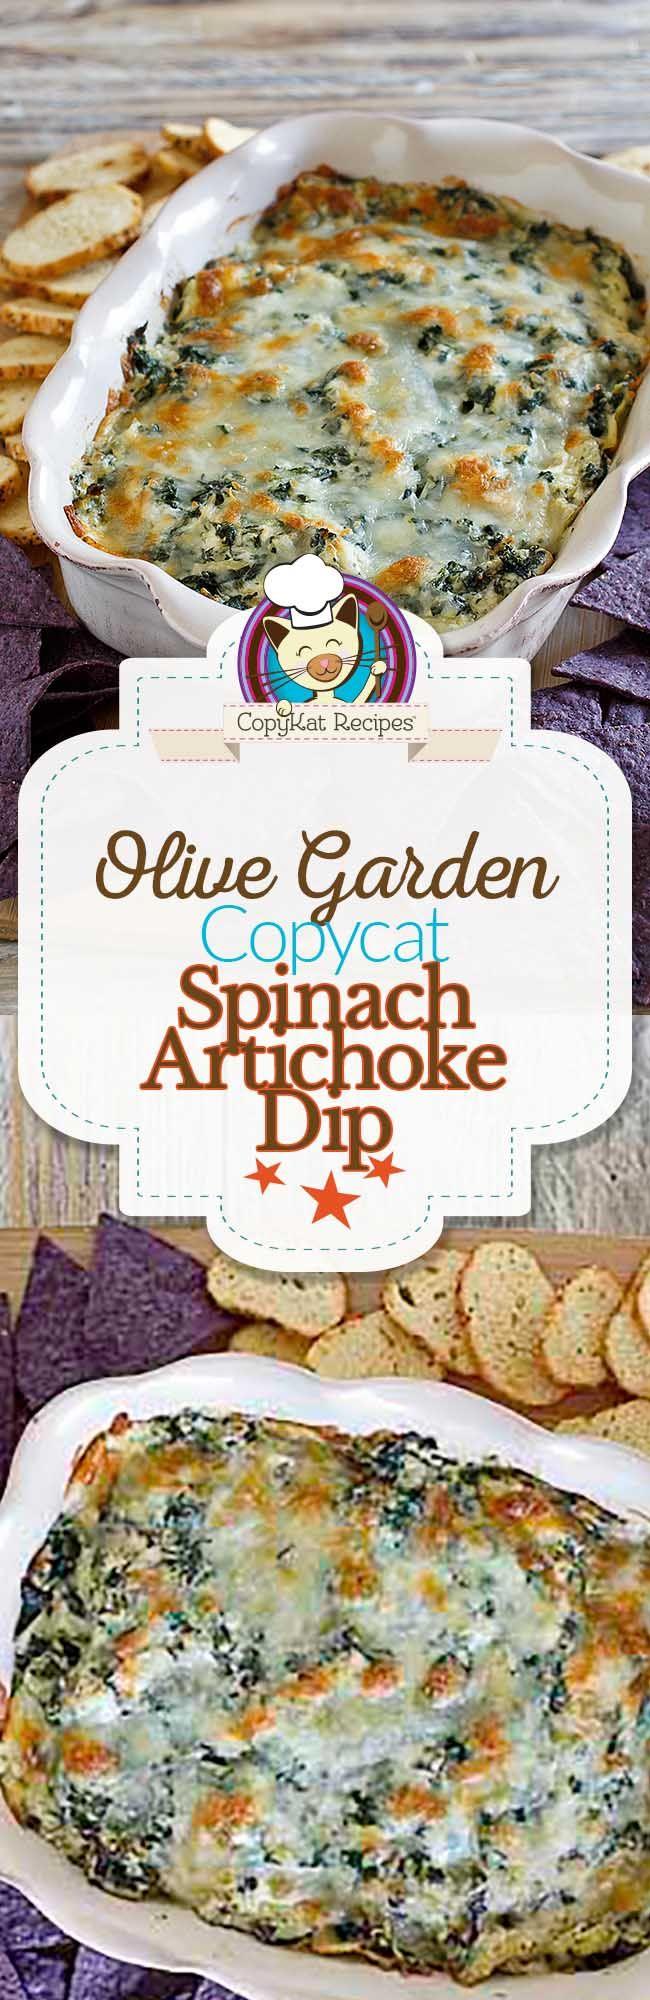 Copycat Olive Garden Spinach Artichoke Dip Recipe Copykat Recipes Recipes Copycat Recipes